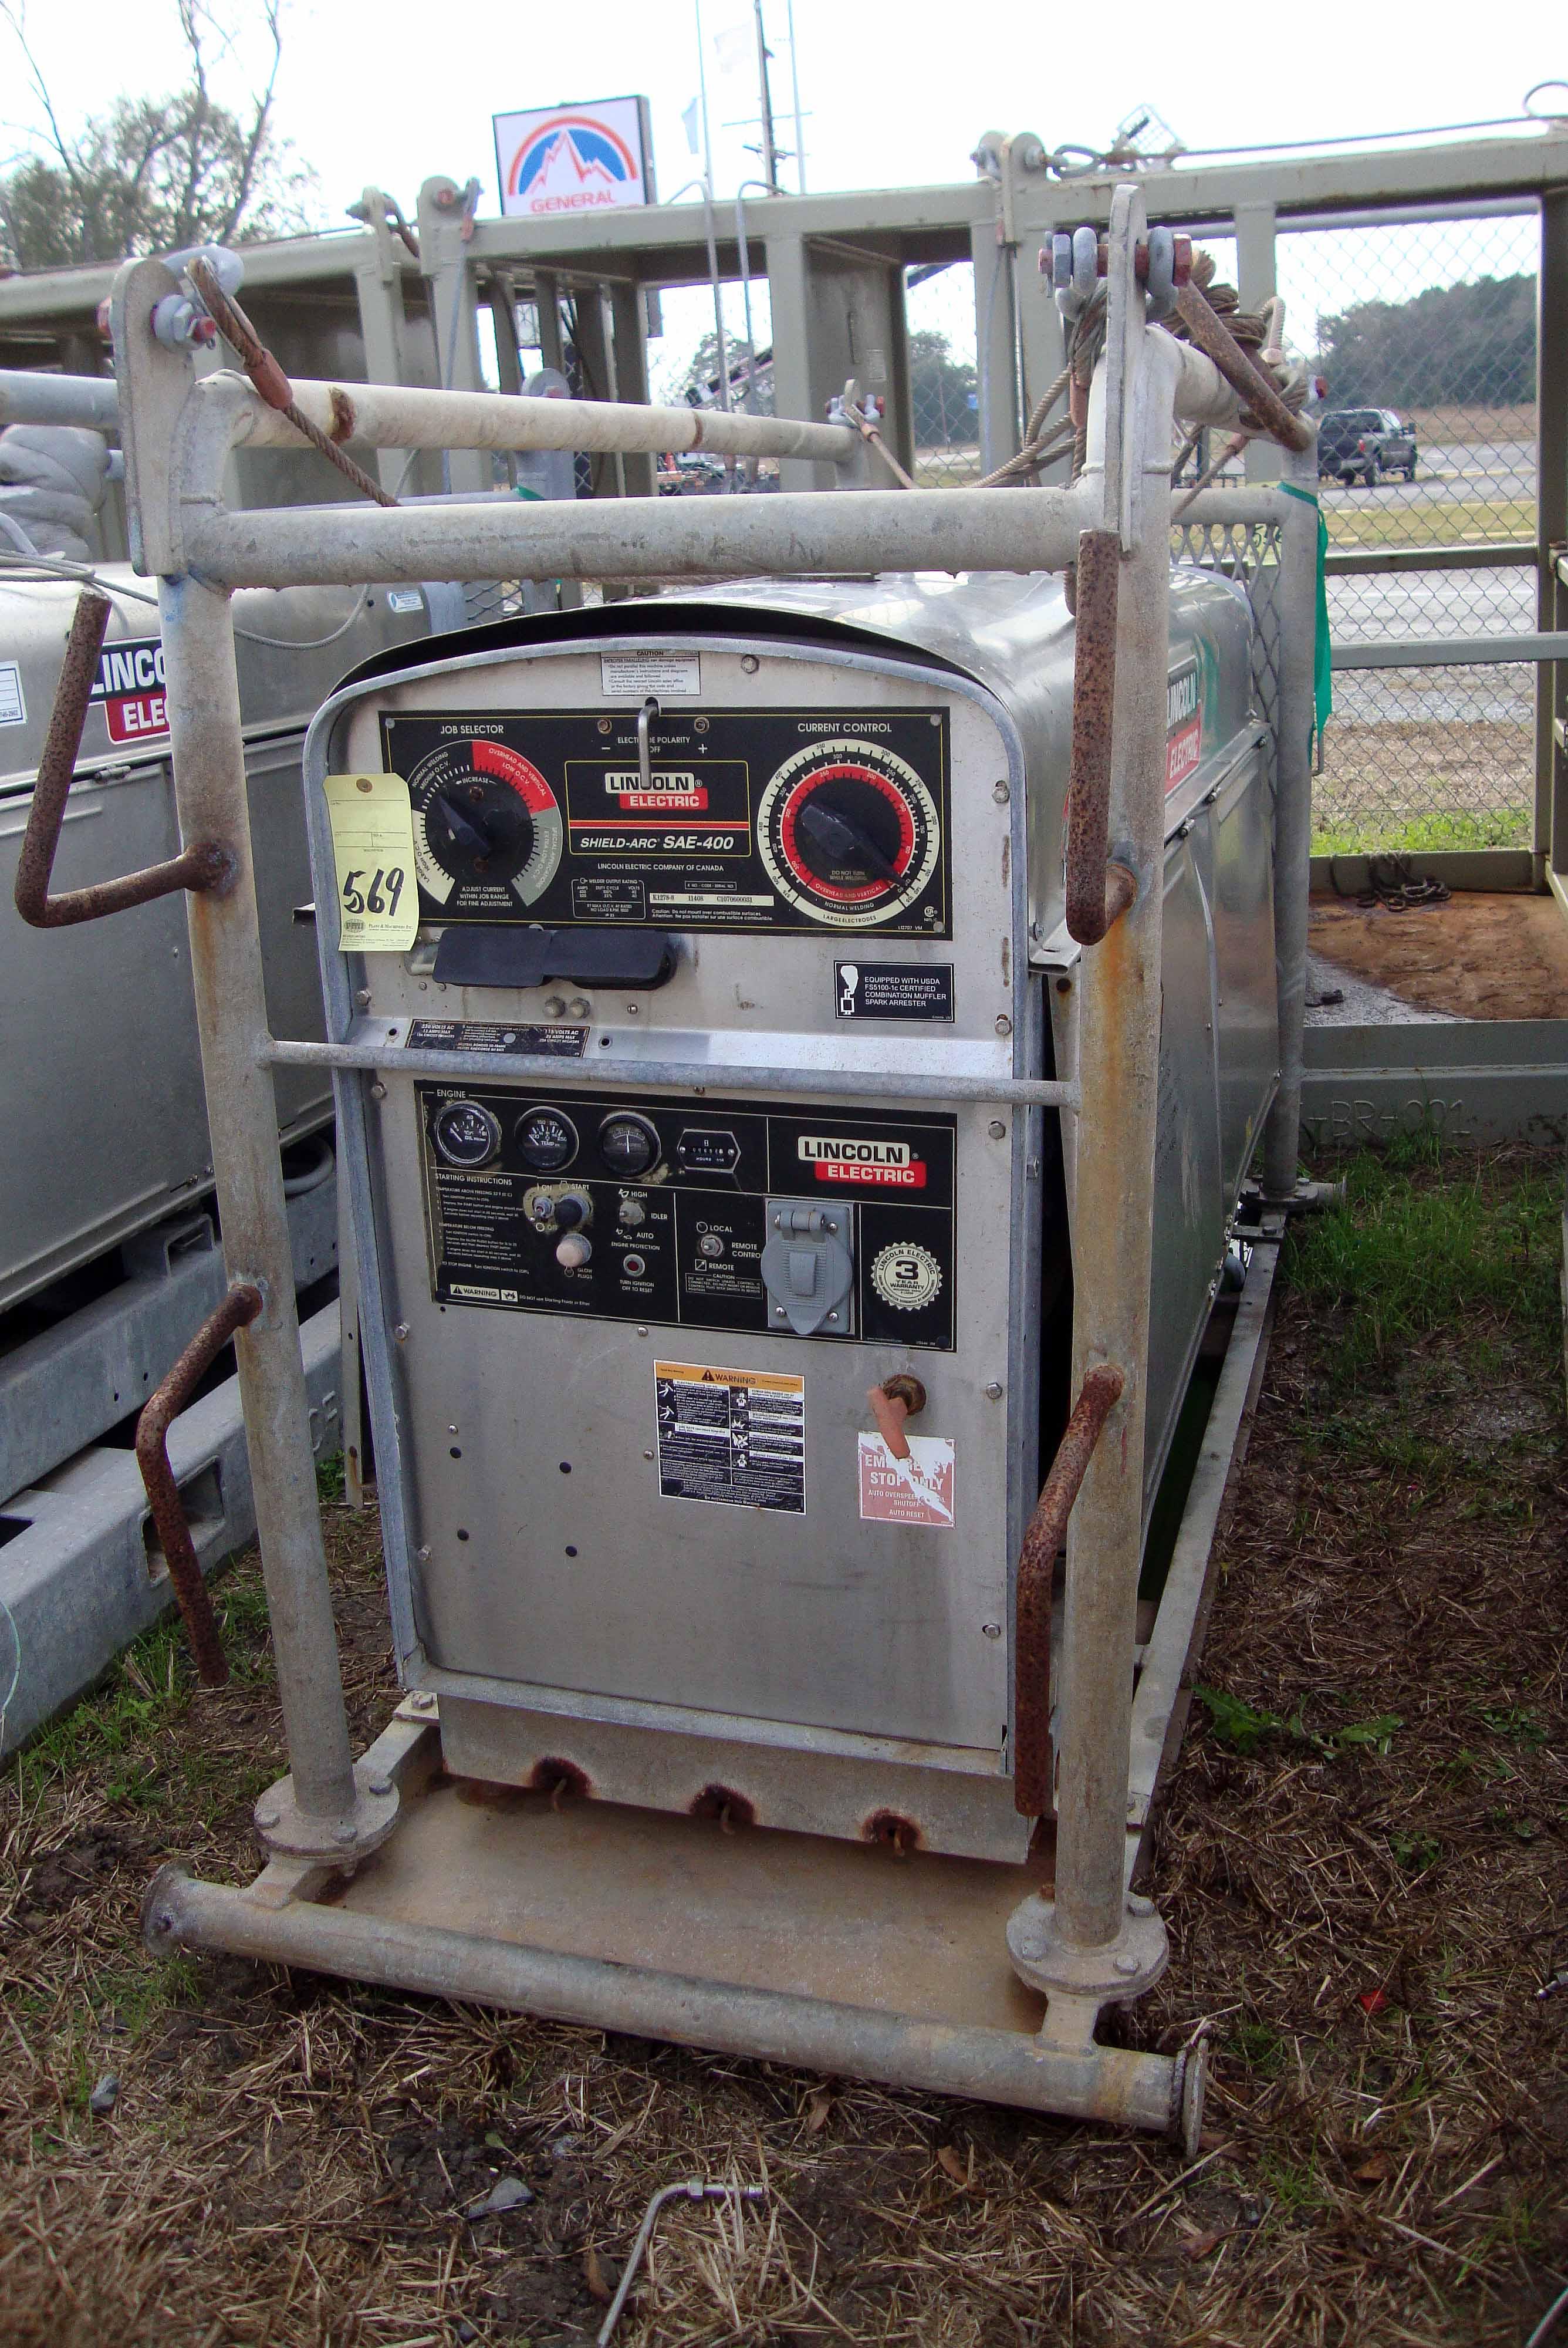 Lincoln Sae 400 Welder Wiring Diagram Schematic Diagrams Vantage Plug Ac225s